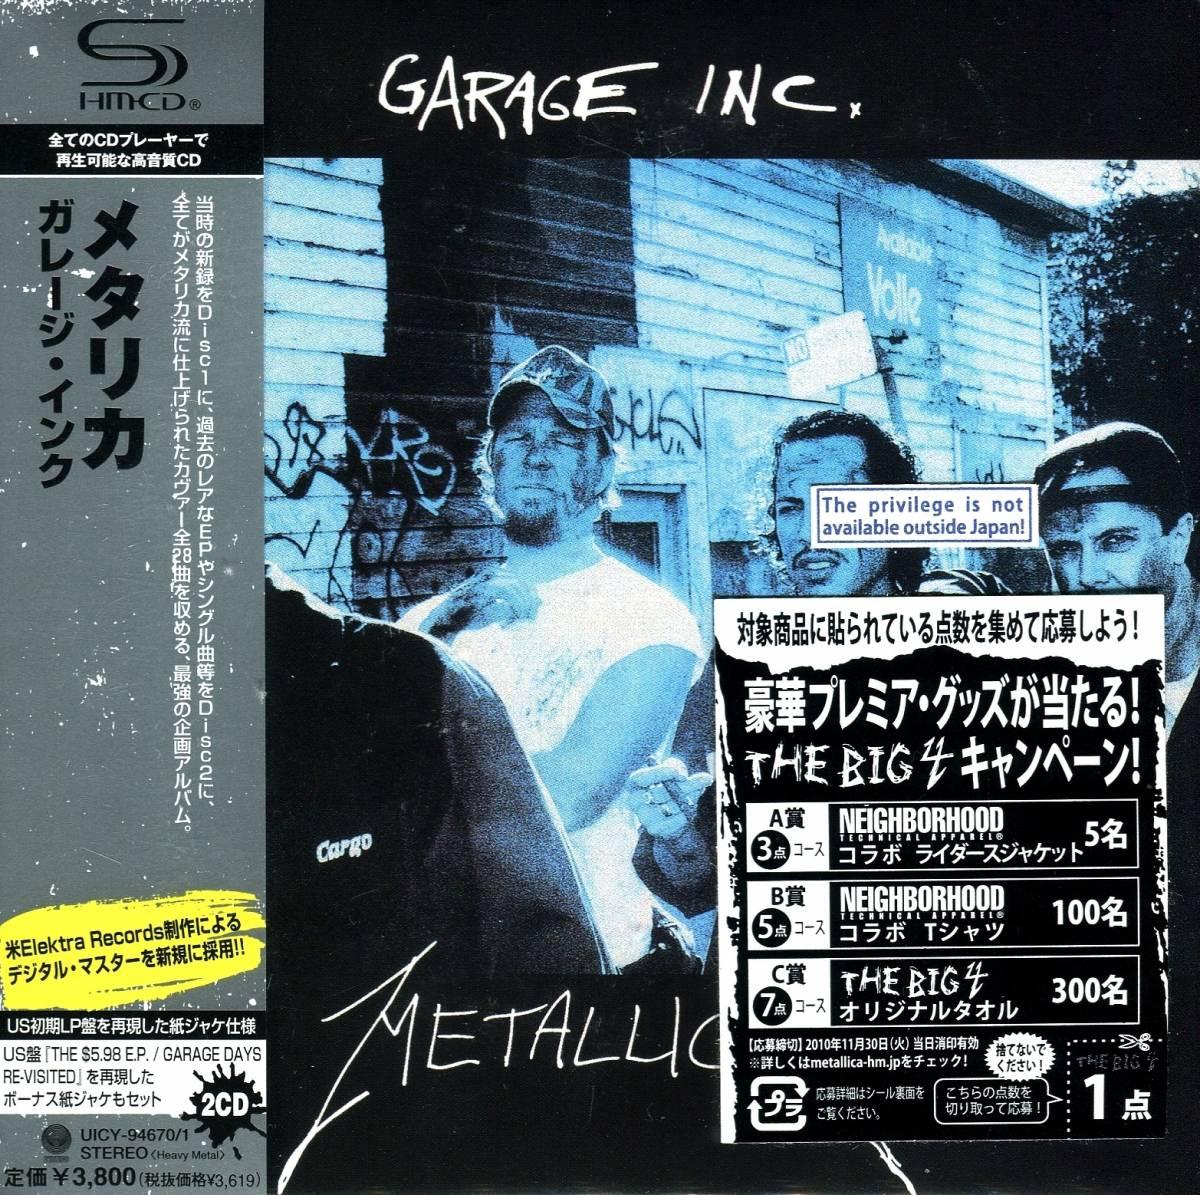 Metallica Garage Inc 2 Shm Cd 2010 Compilation Limited